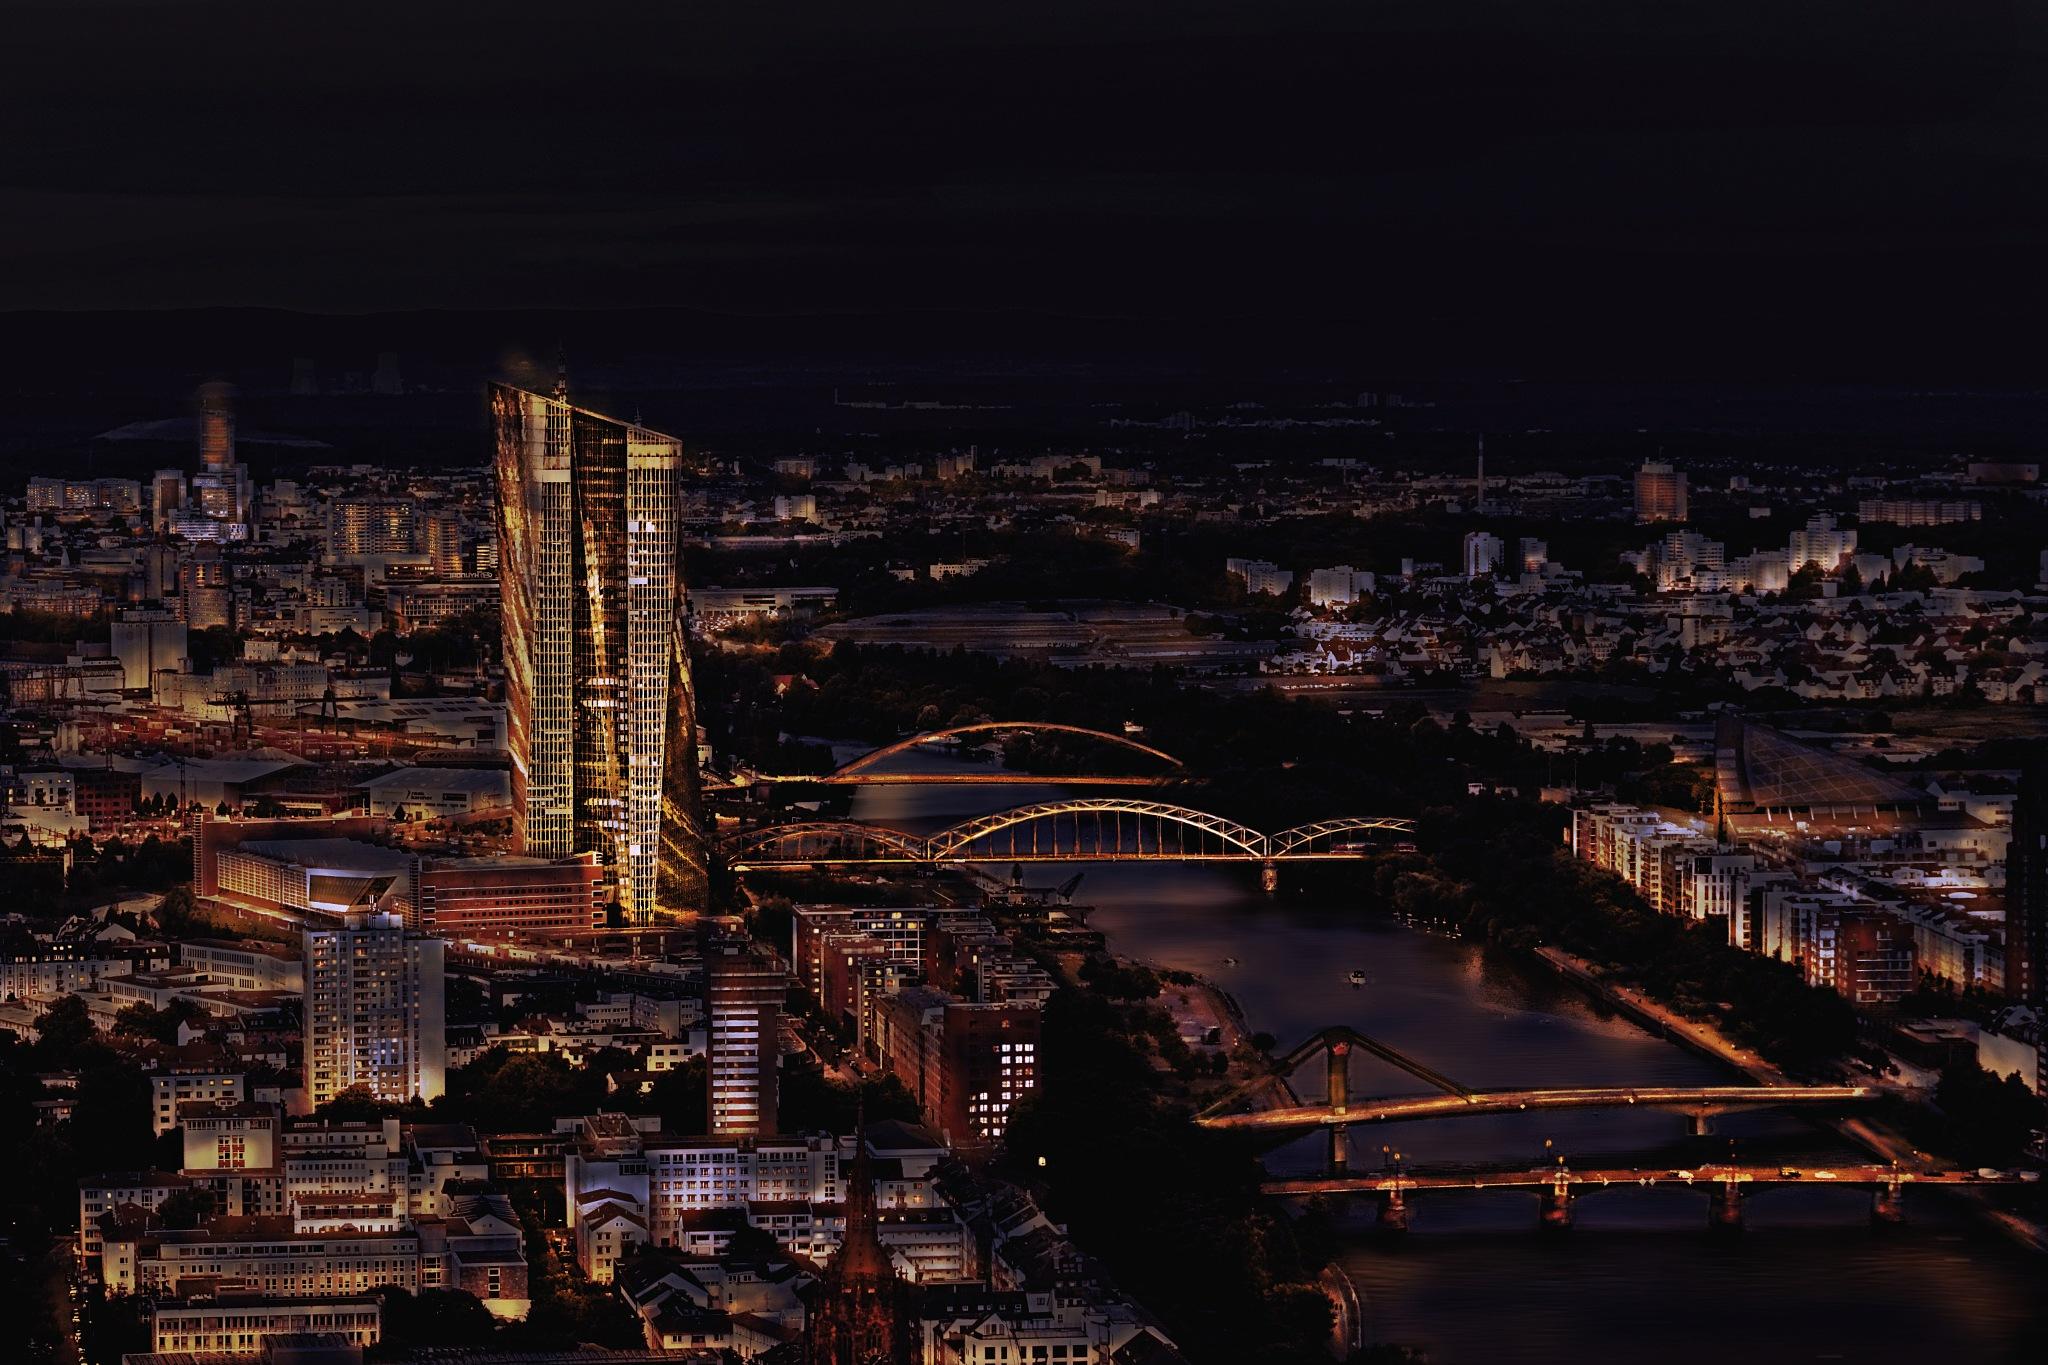 Frankfurt (Main) Night by Anja